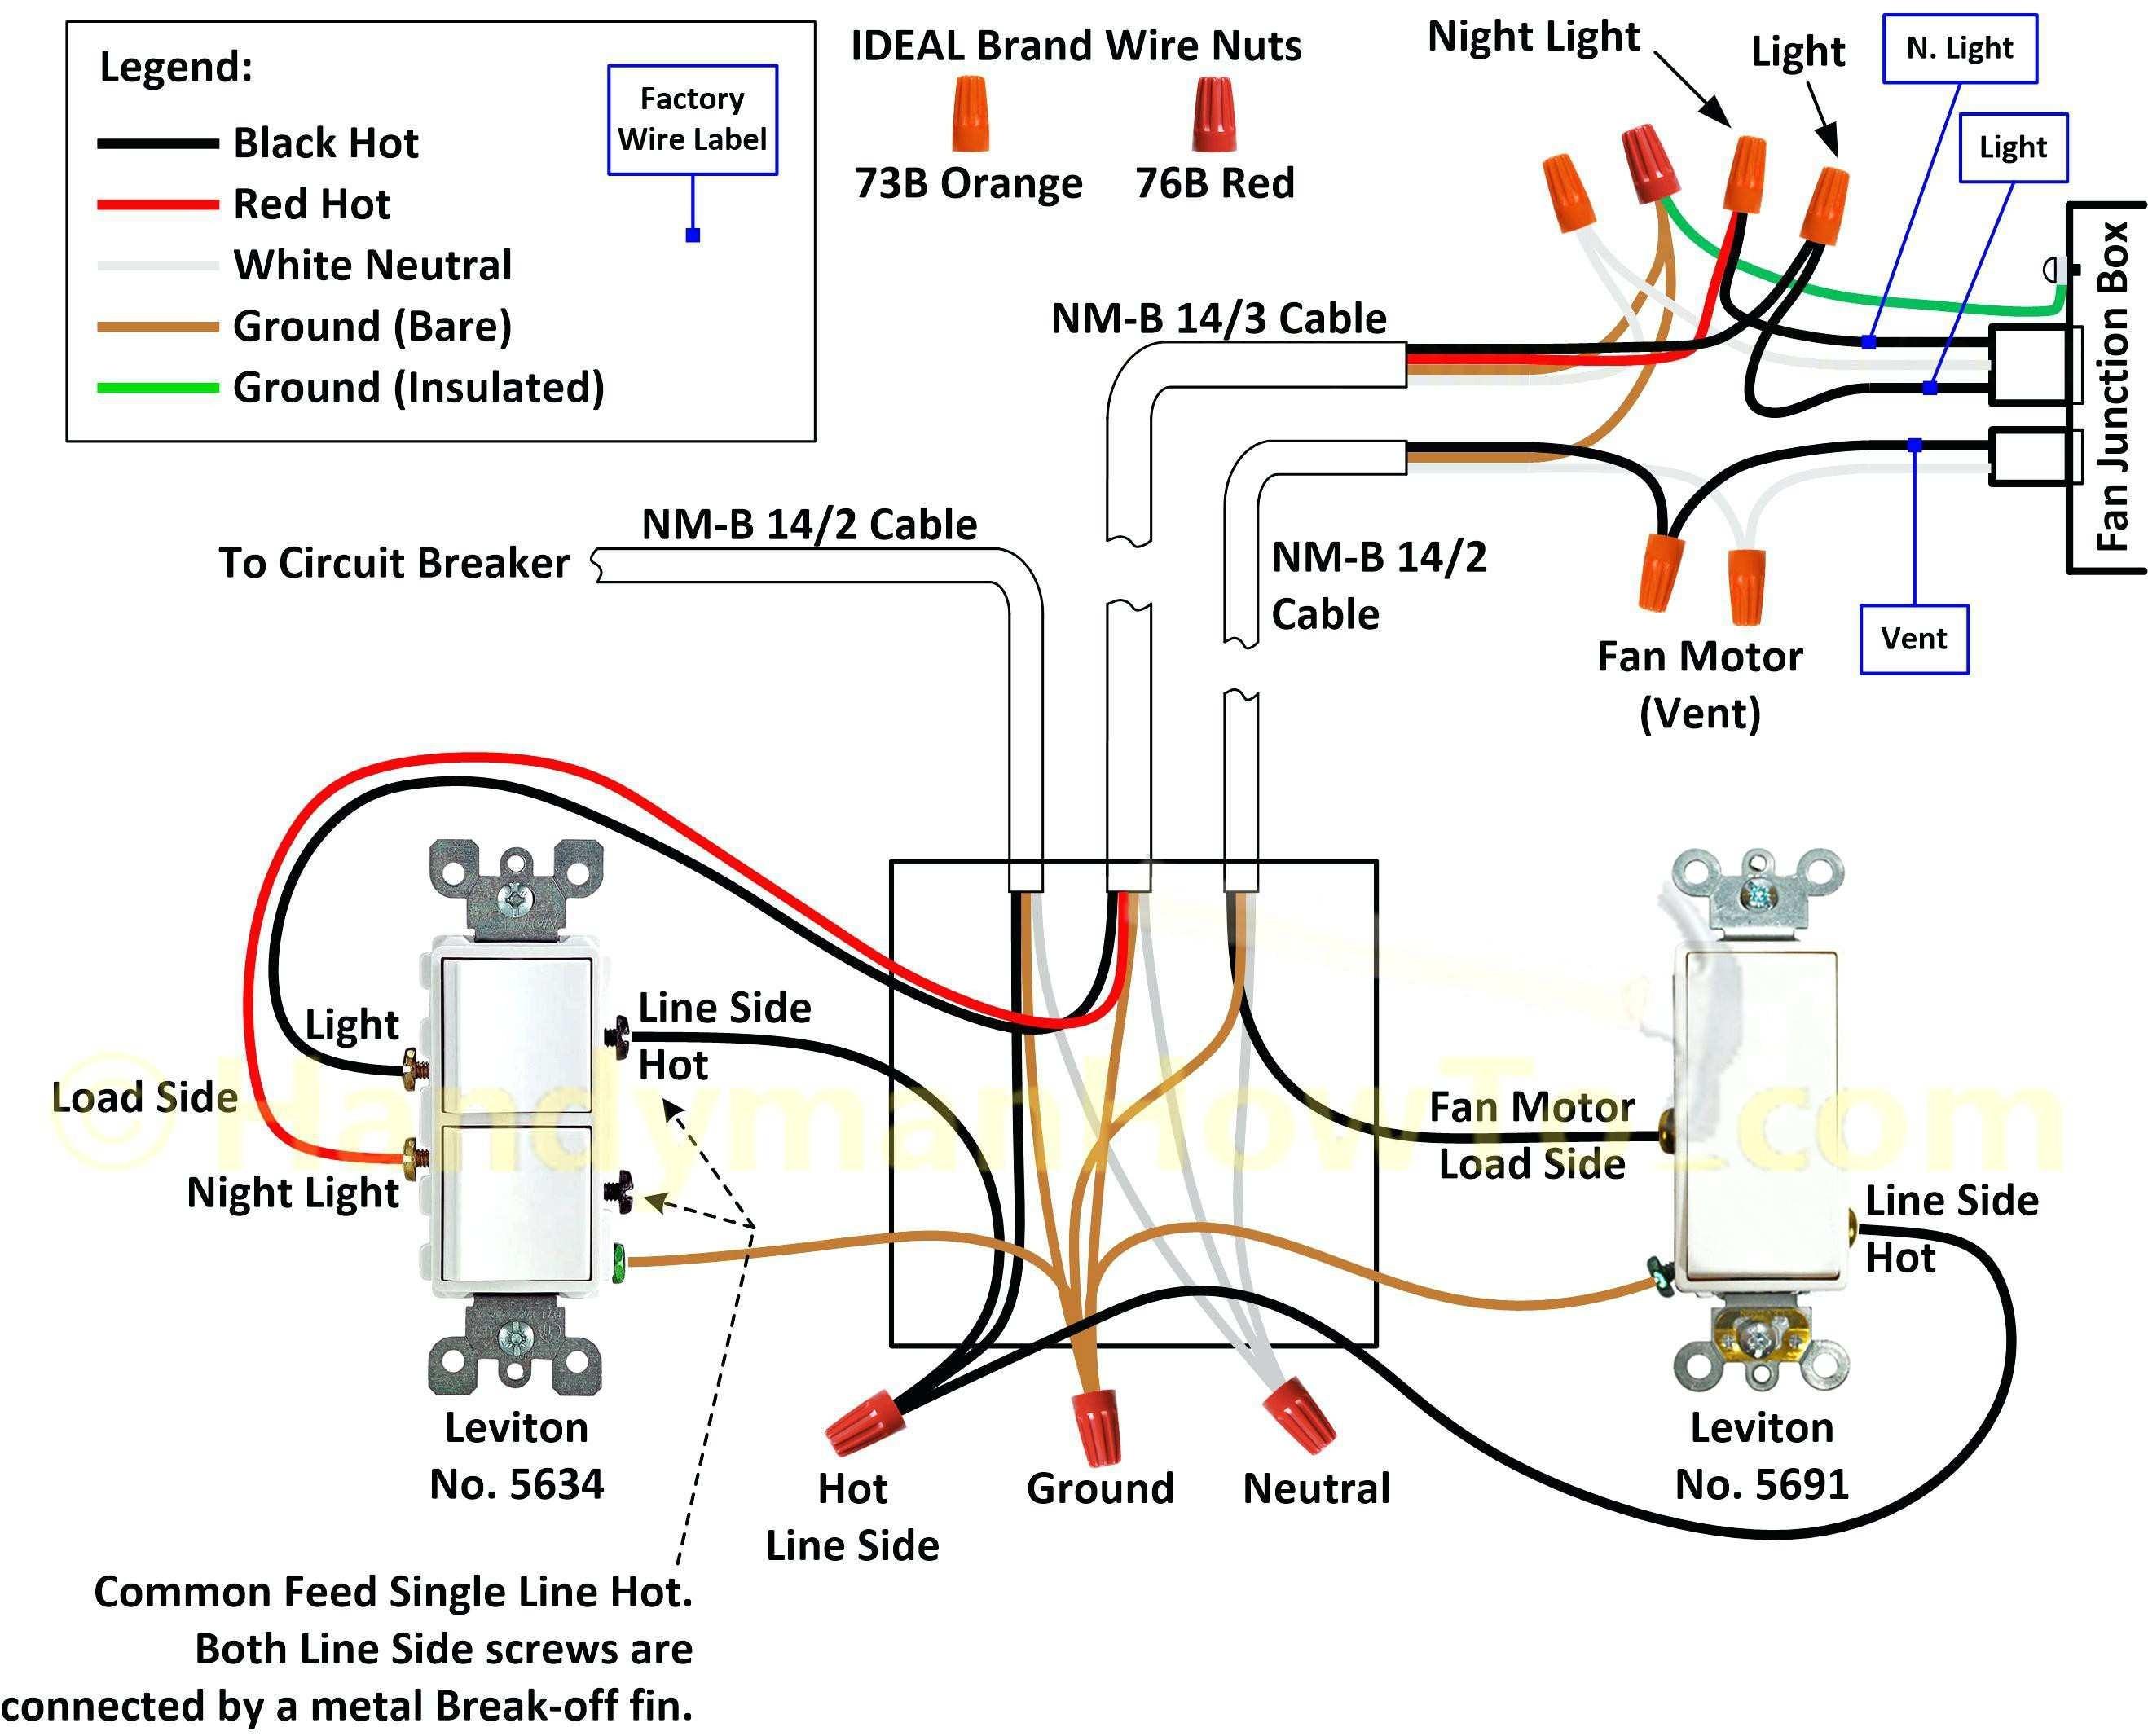 Third Brake Light Wiring Diagram Wiring Diagram Keystone Cougar Archives Joescablecar Of Third Brake Light Wiring Diagram